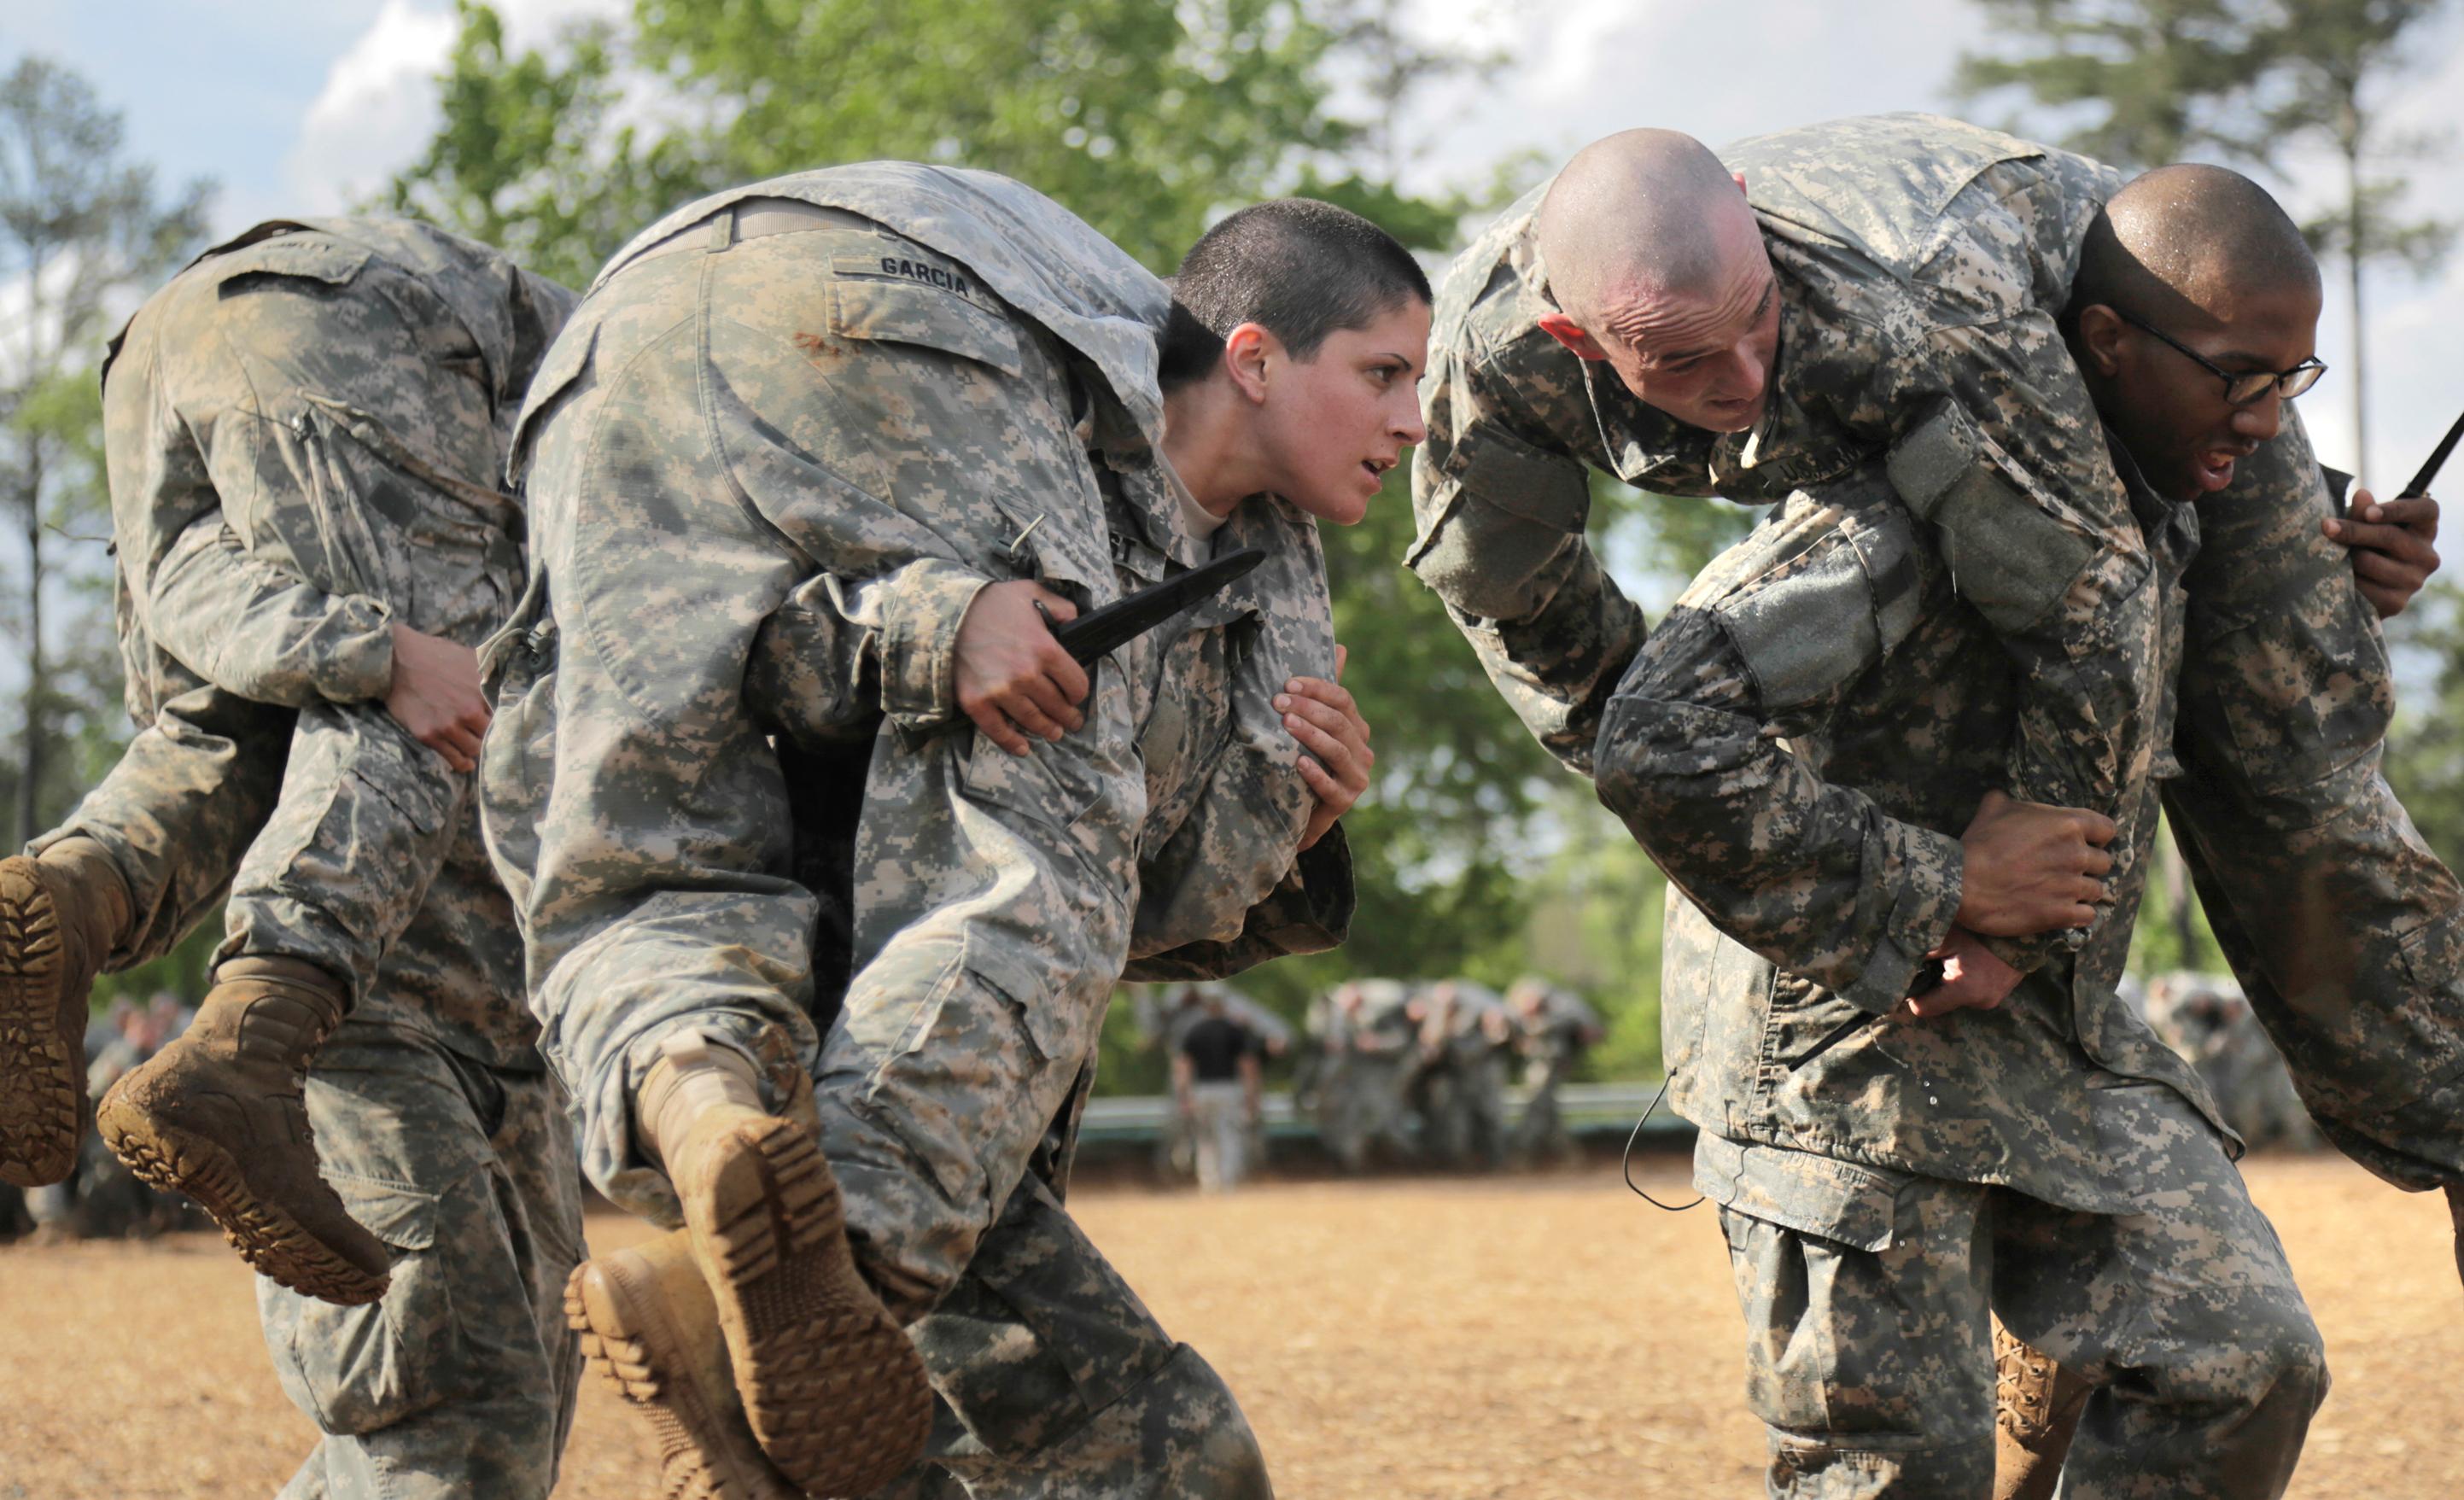 U.S Army • Small Unit • Ranger Tactics Program • Week One